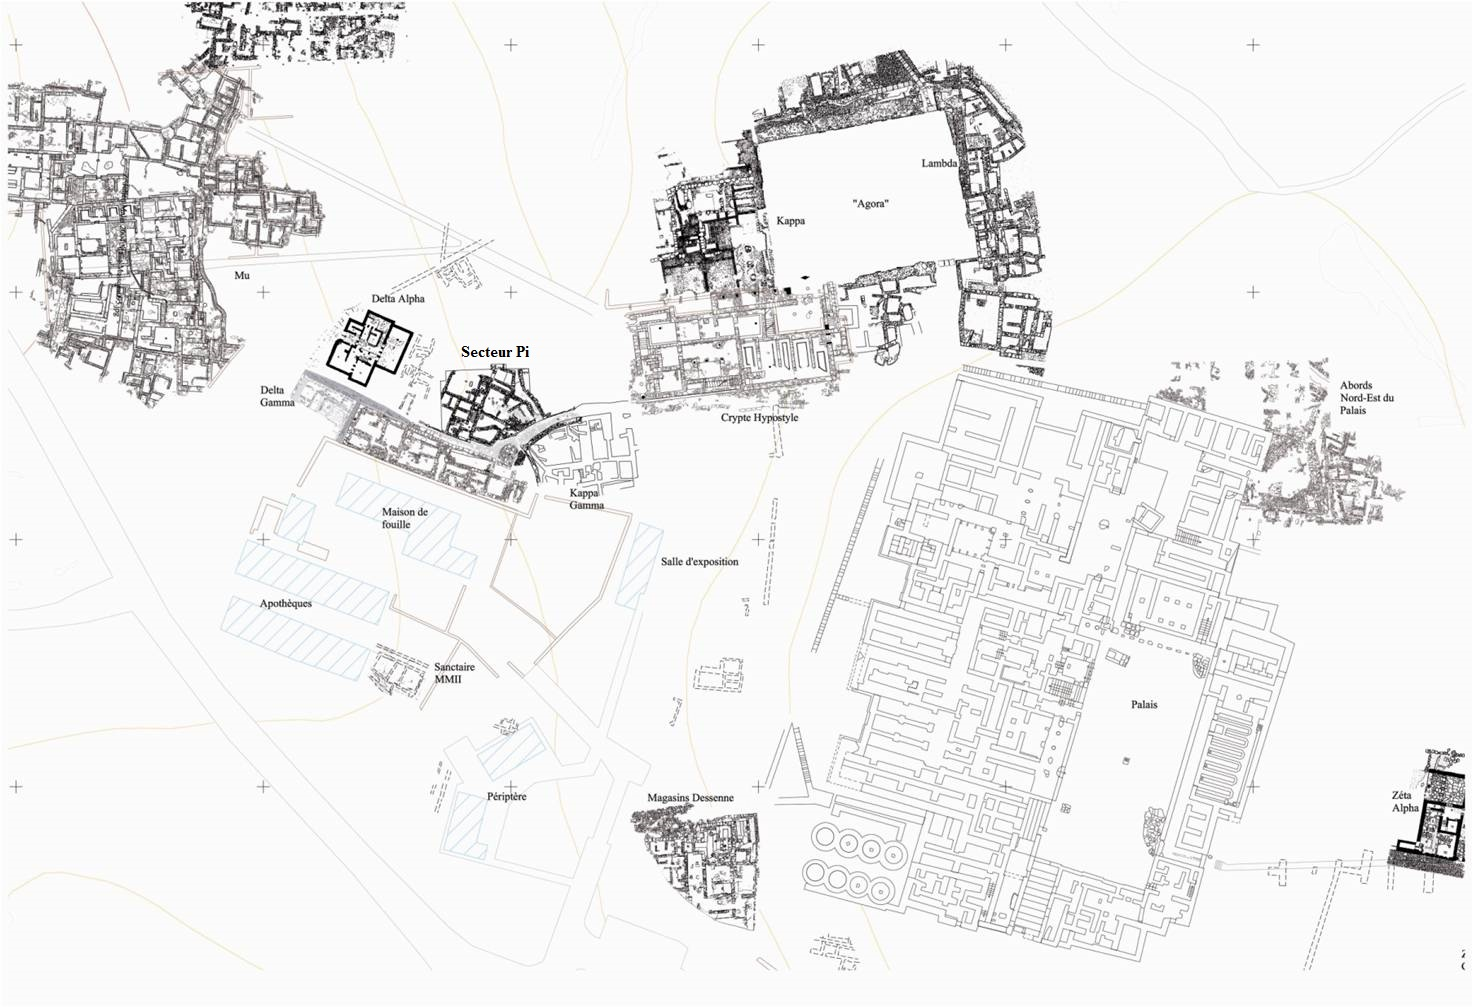 Fig.1 Plan topographique de Malia